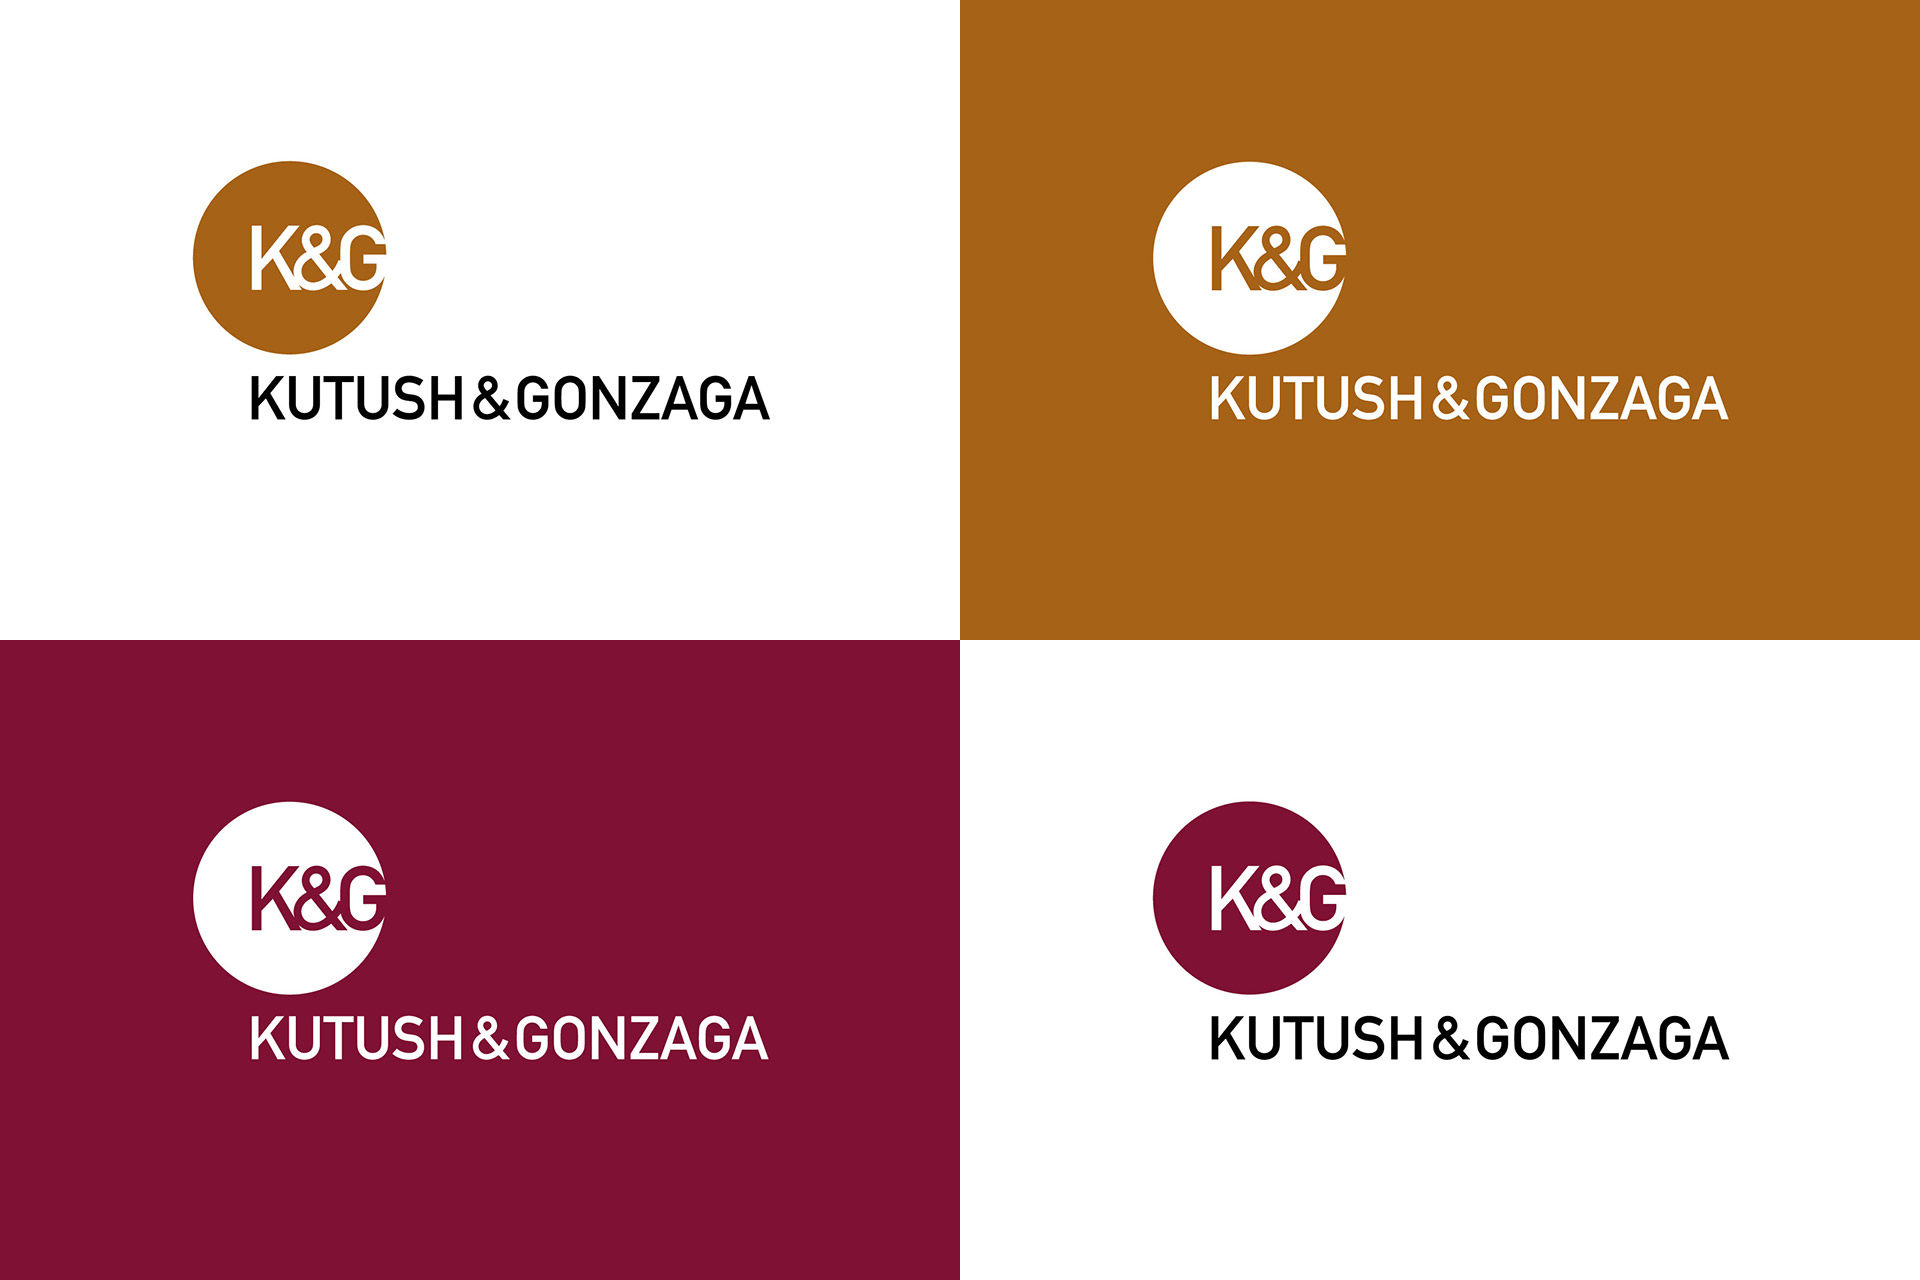 Асгард Брендинг, фирменный стиль, айдентика, лого, K&G, Kutush & Gonzaga, дизайн, графический дизайн